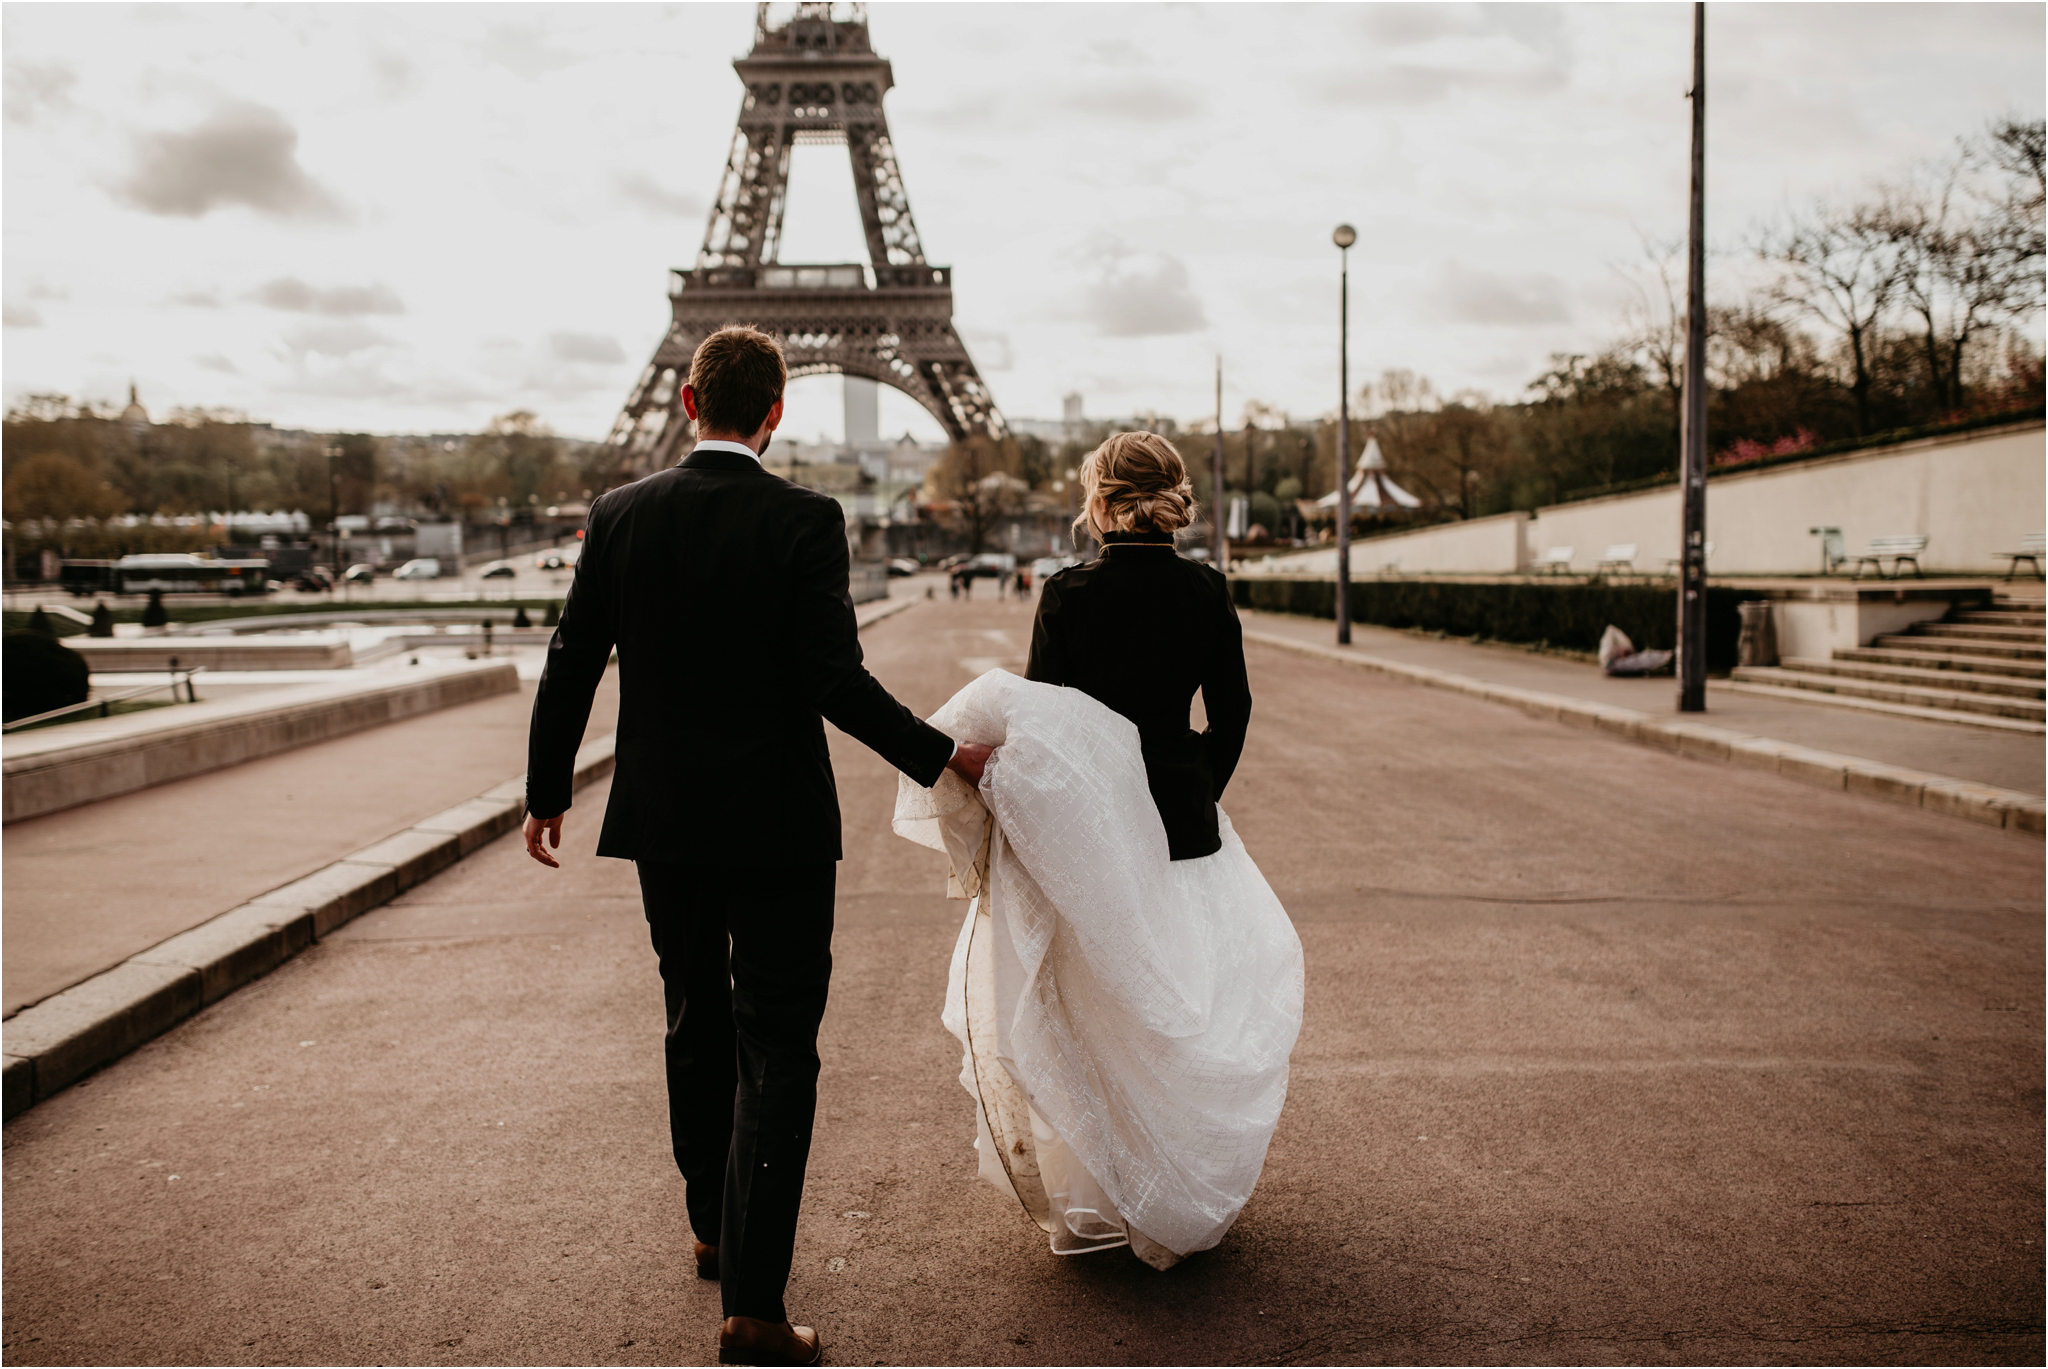 miranda-and-jared-paris-elopement-destination-wedding-photographer-080.jpg